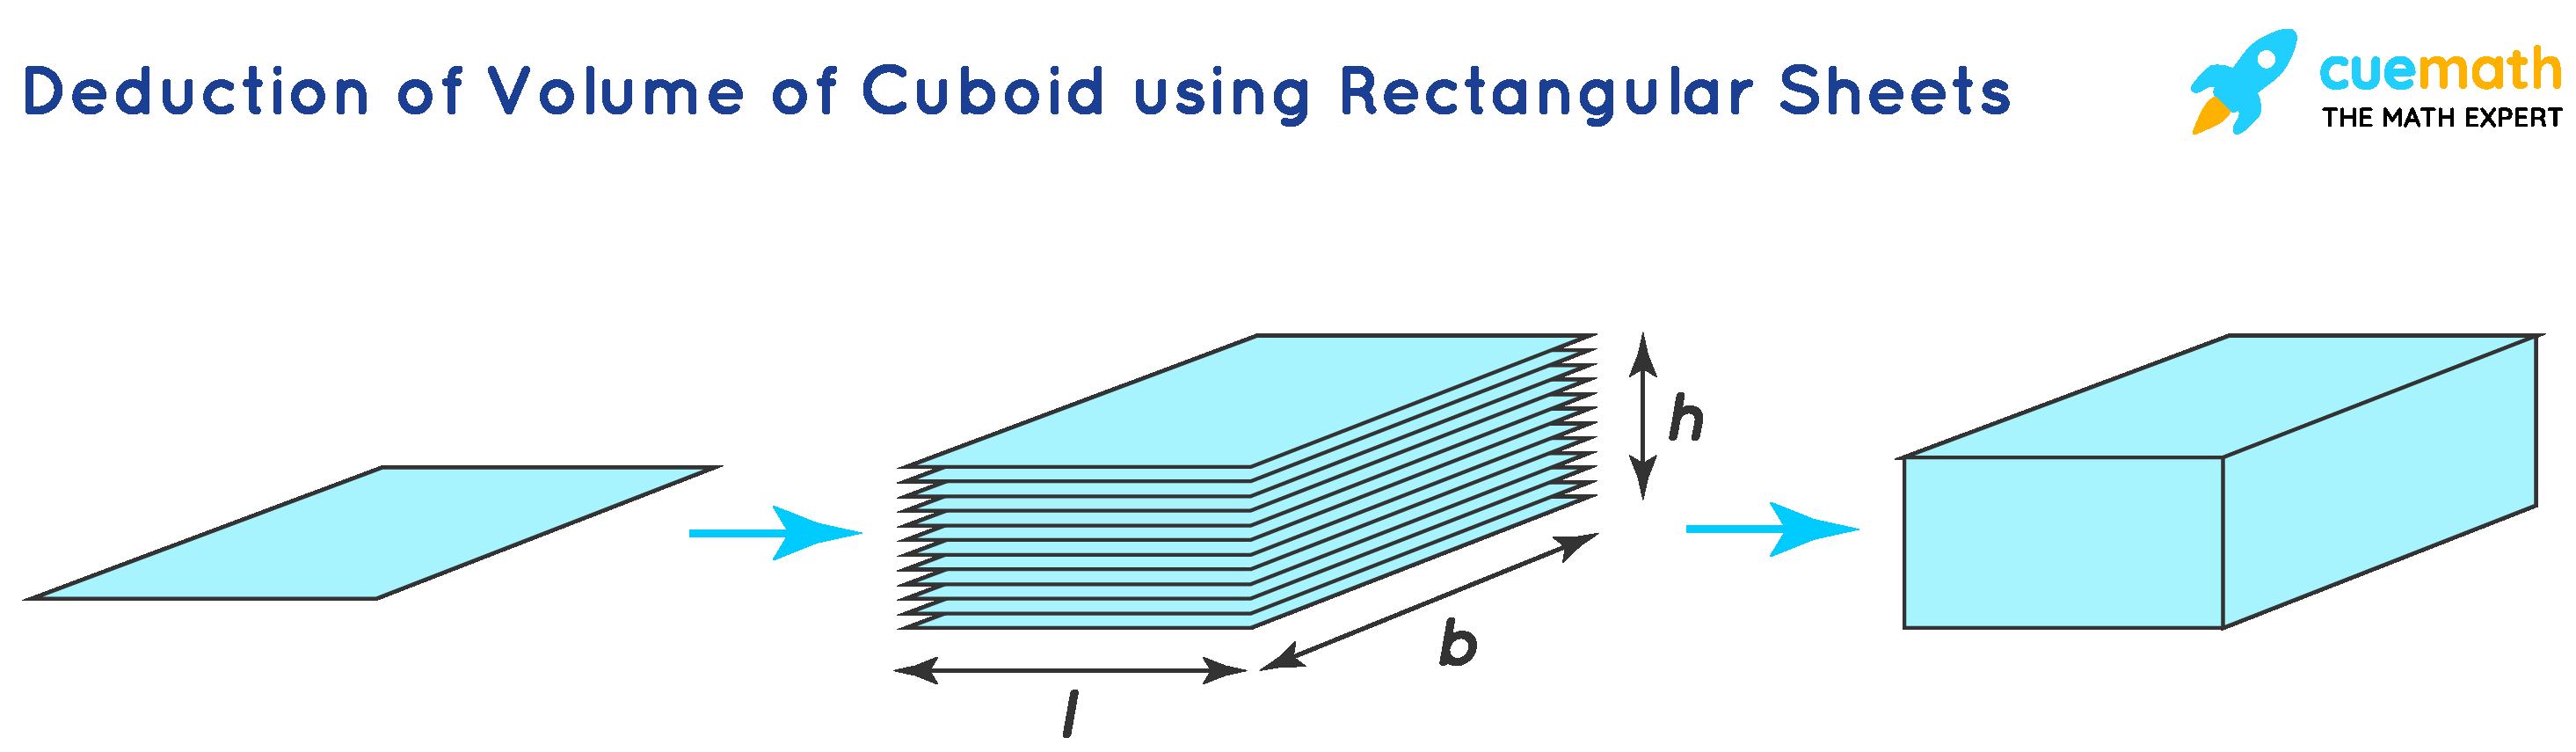 Cuboid Volume using Rectangular Sheets